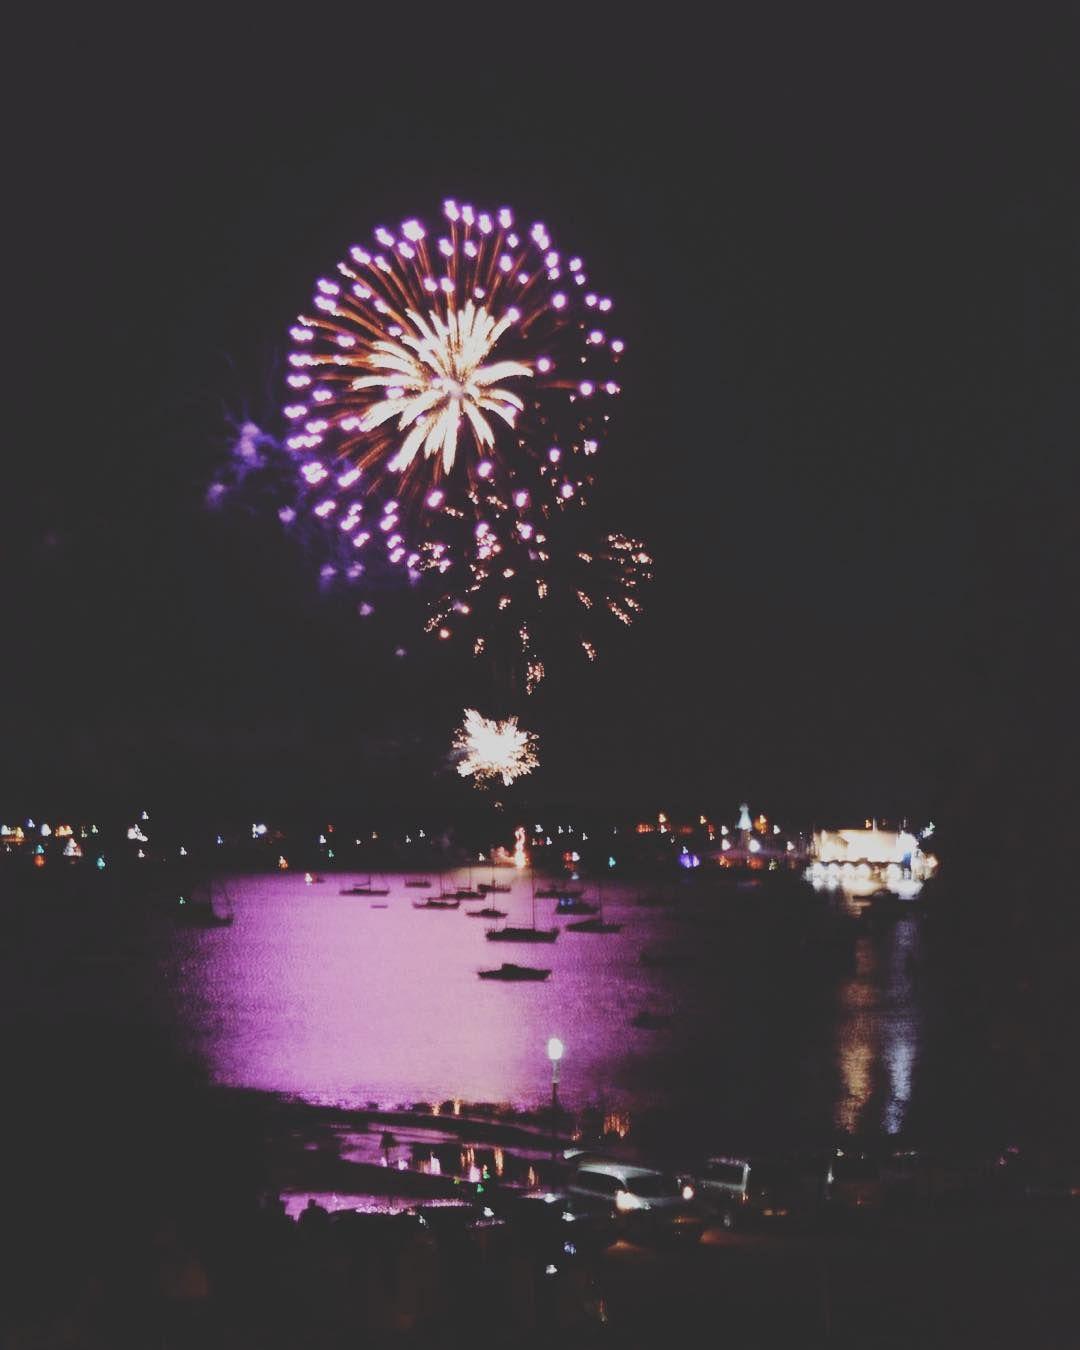 #nikonphotography #NYE #Nikon #nikond5200 #happynewyear #fireworks #geelong #geelongwaterfront by throughalens5 http://ift.tt/1JtS0vo